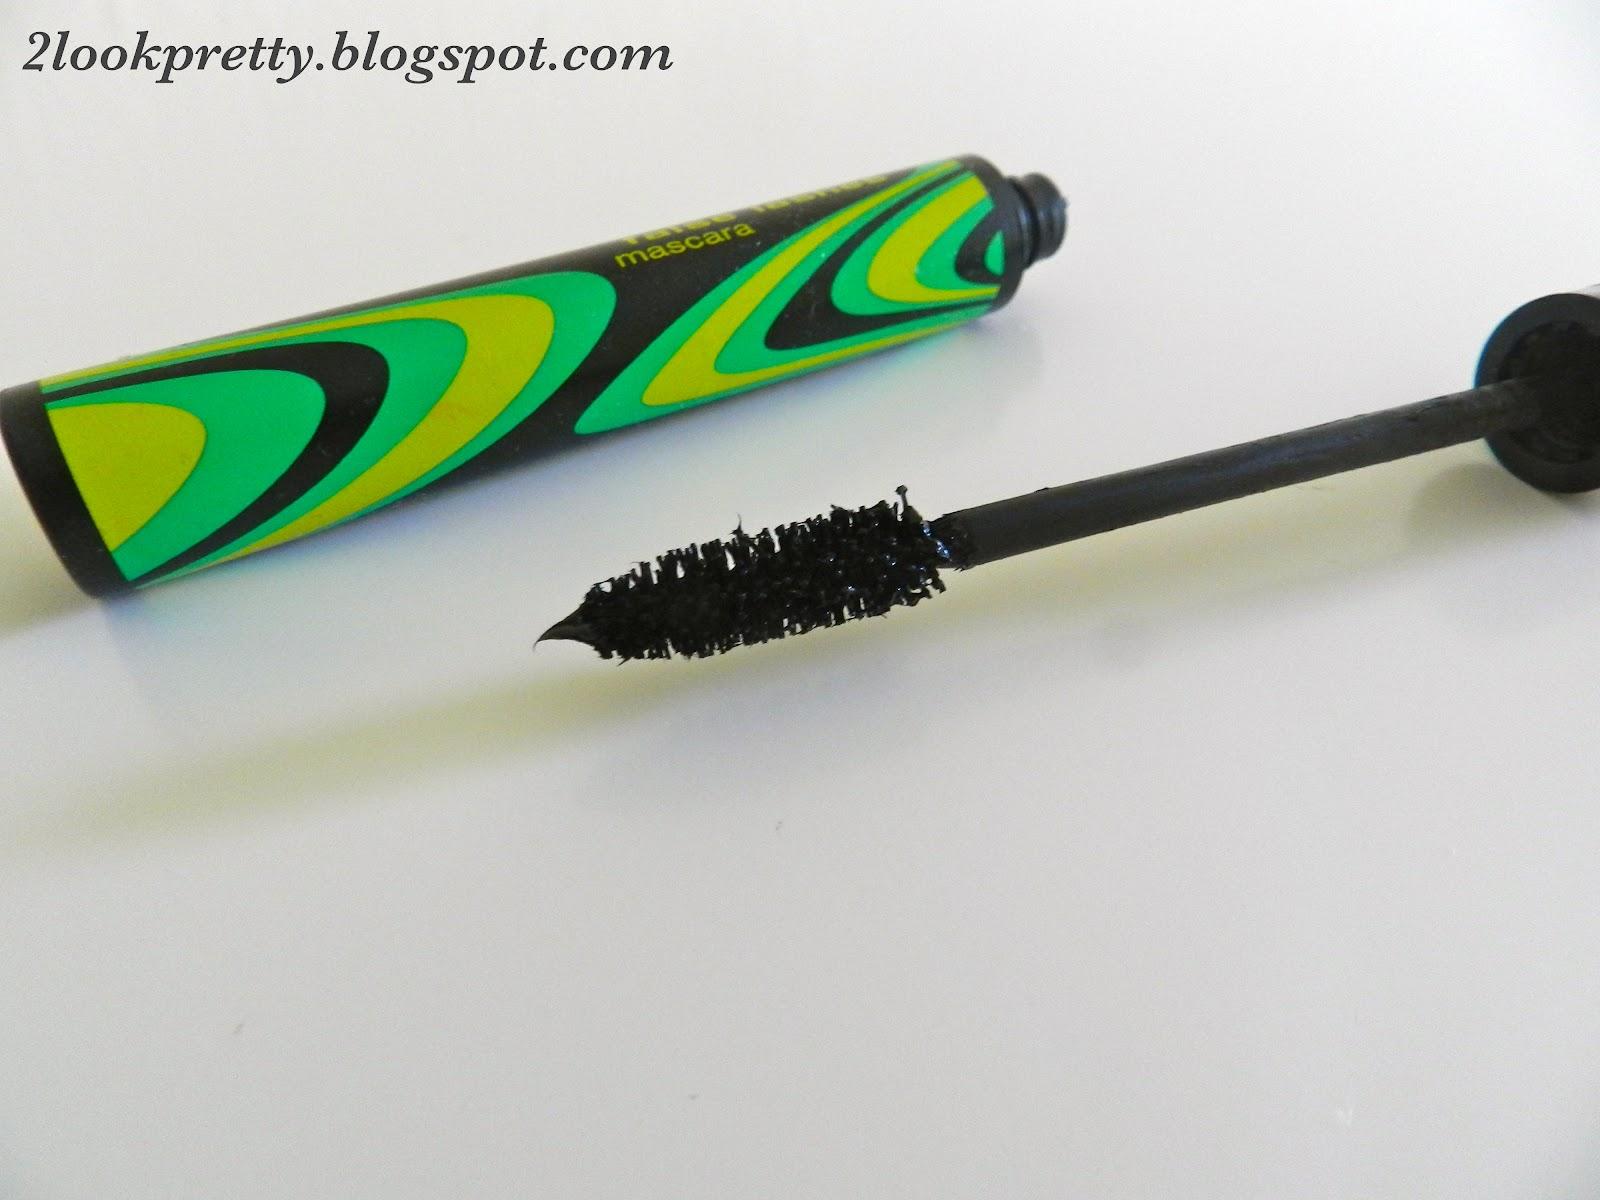 19a71397b13 2 Look Pretty: Essence Multi Action False Lashes Mascara